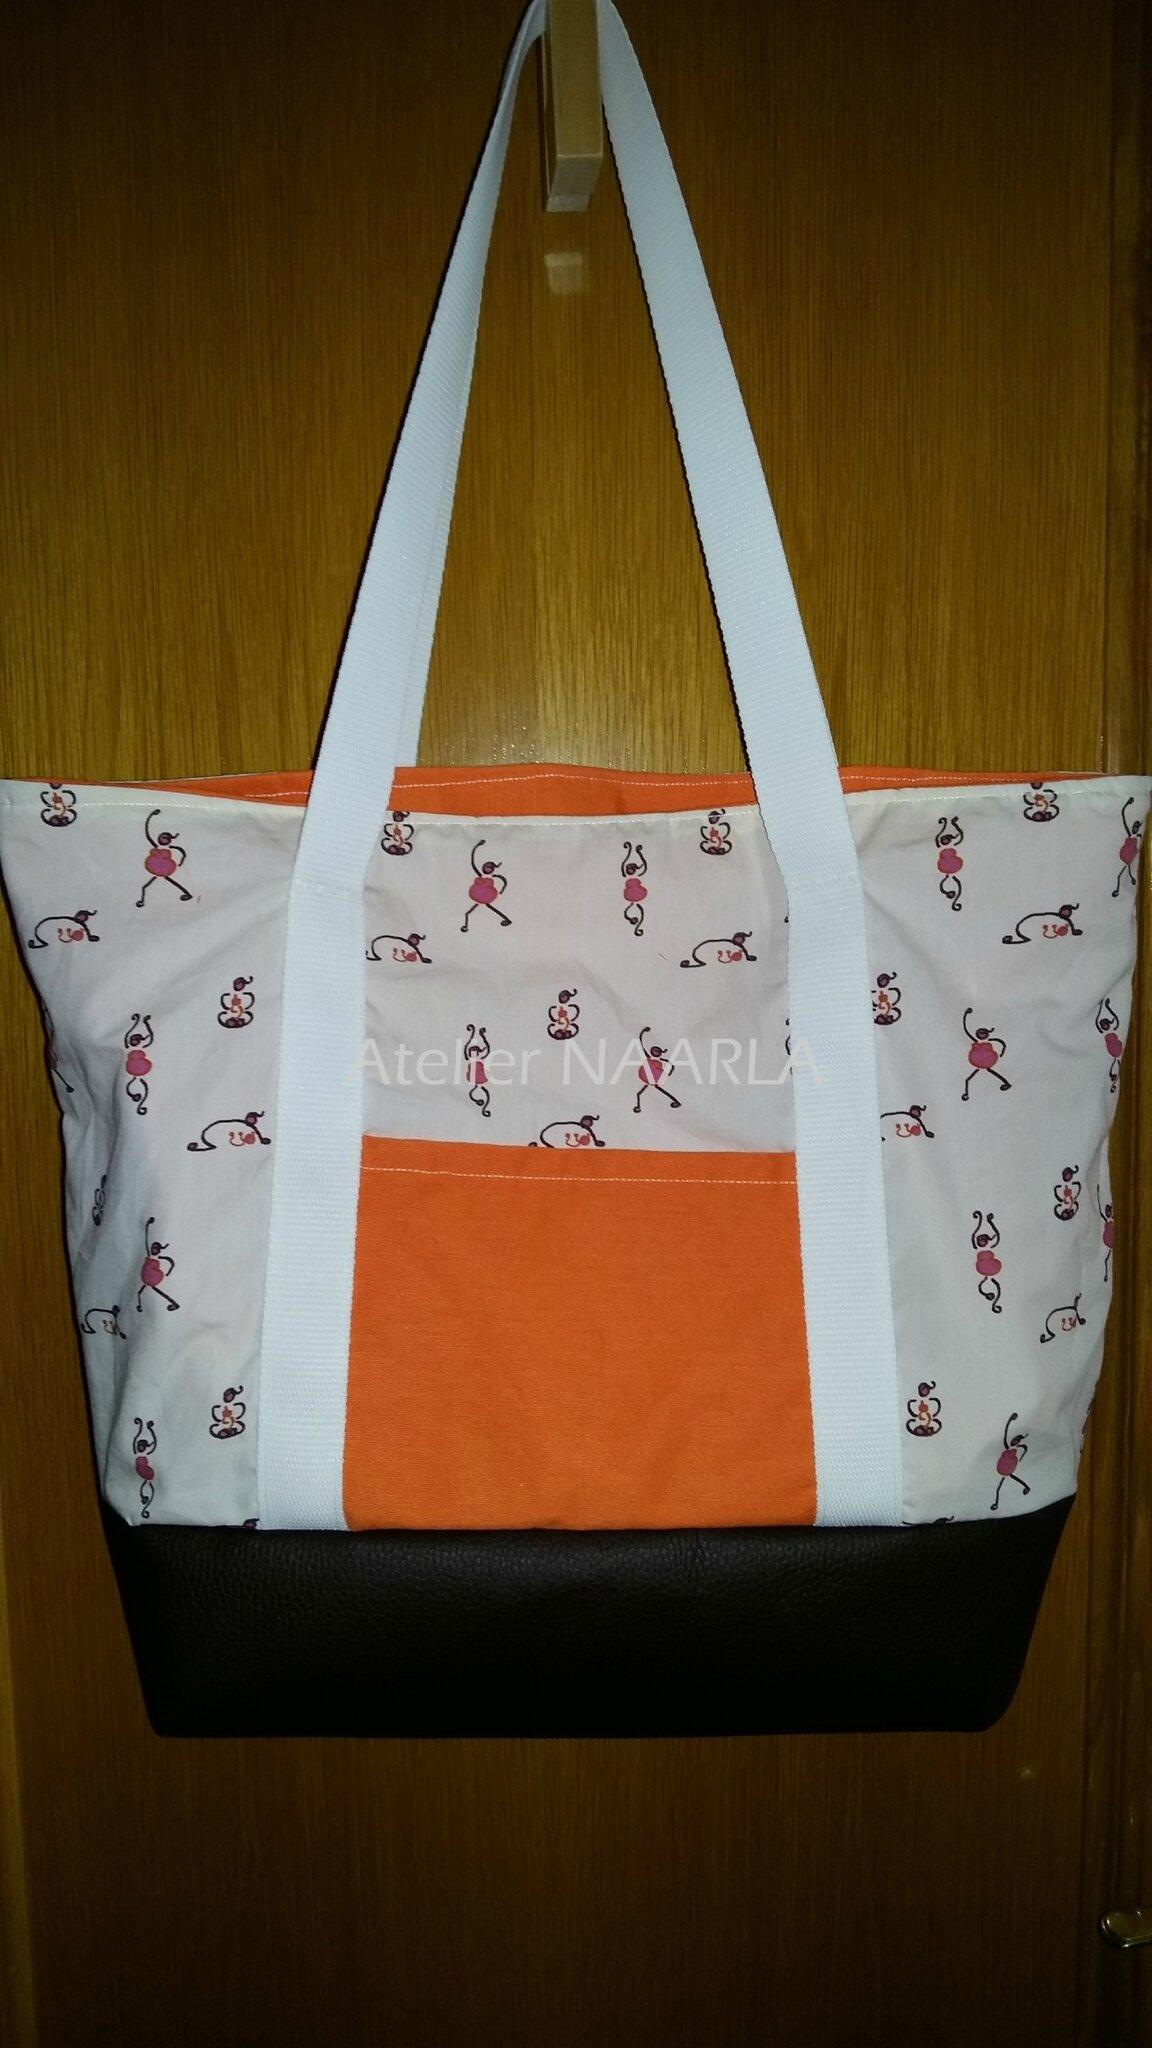 Bolso con tela personalisada/ Sac avec tissus personnalisé